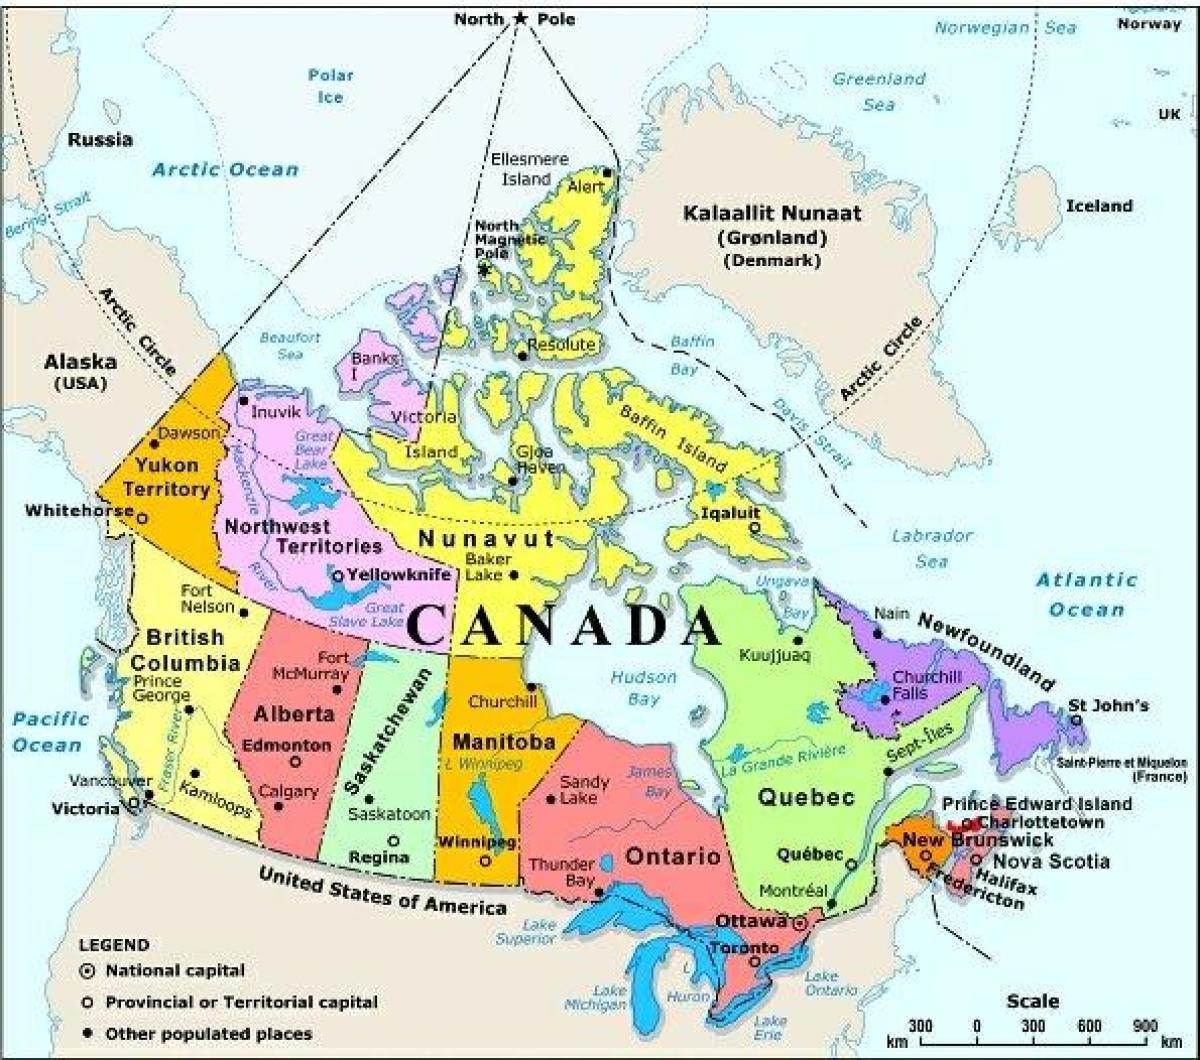 America Occidentale Cartina.Canada Occidentale Mappa Con Le Citta Mappa Del Canada Occidentale Con La Citta America Del Nord America